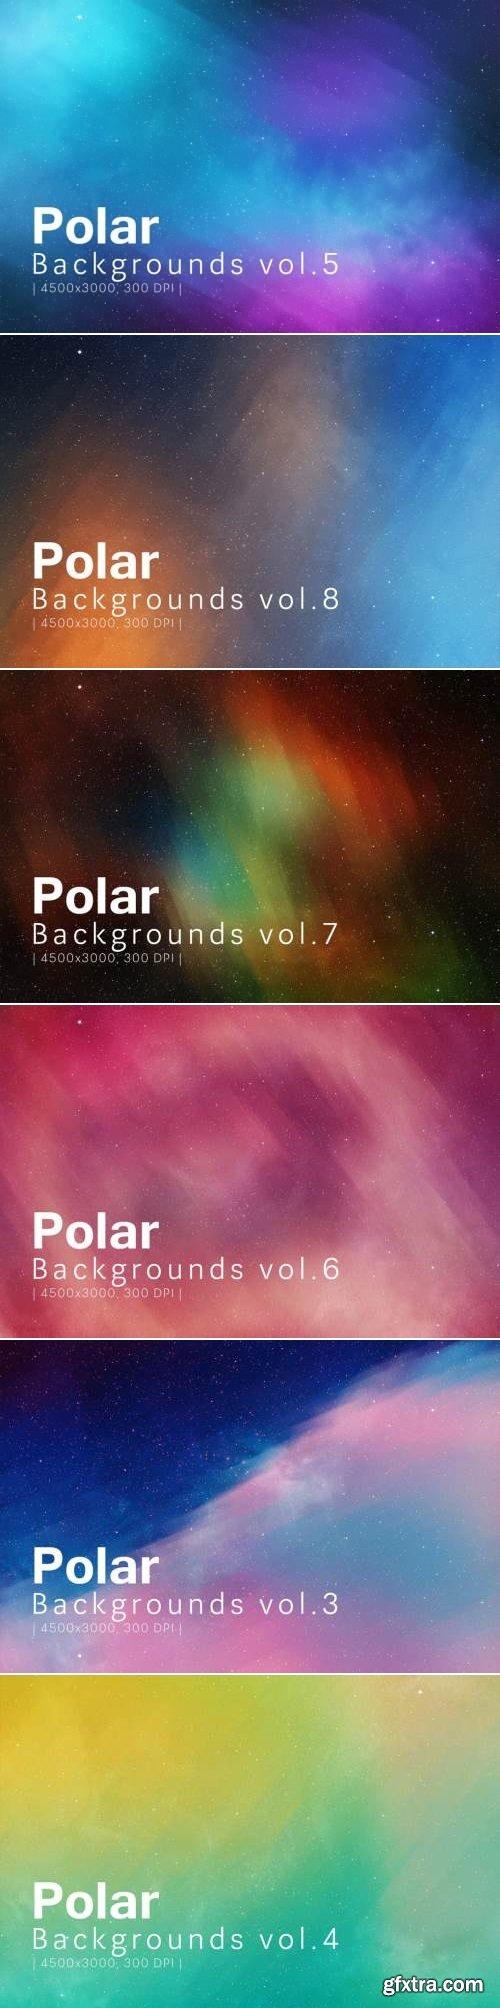 Polar Backgrounds Bundle 2